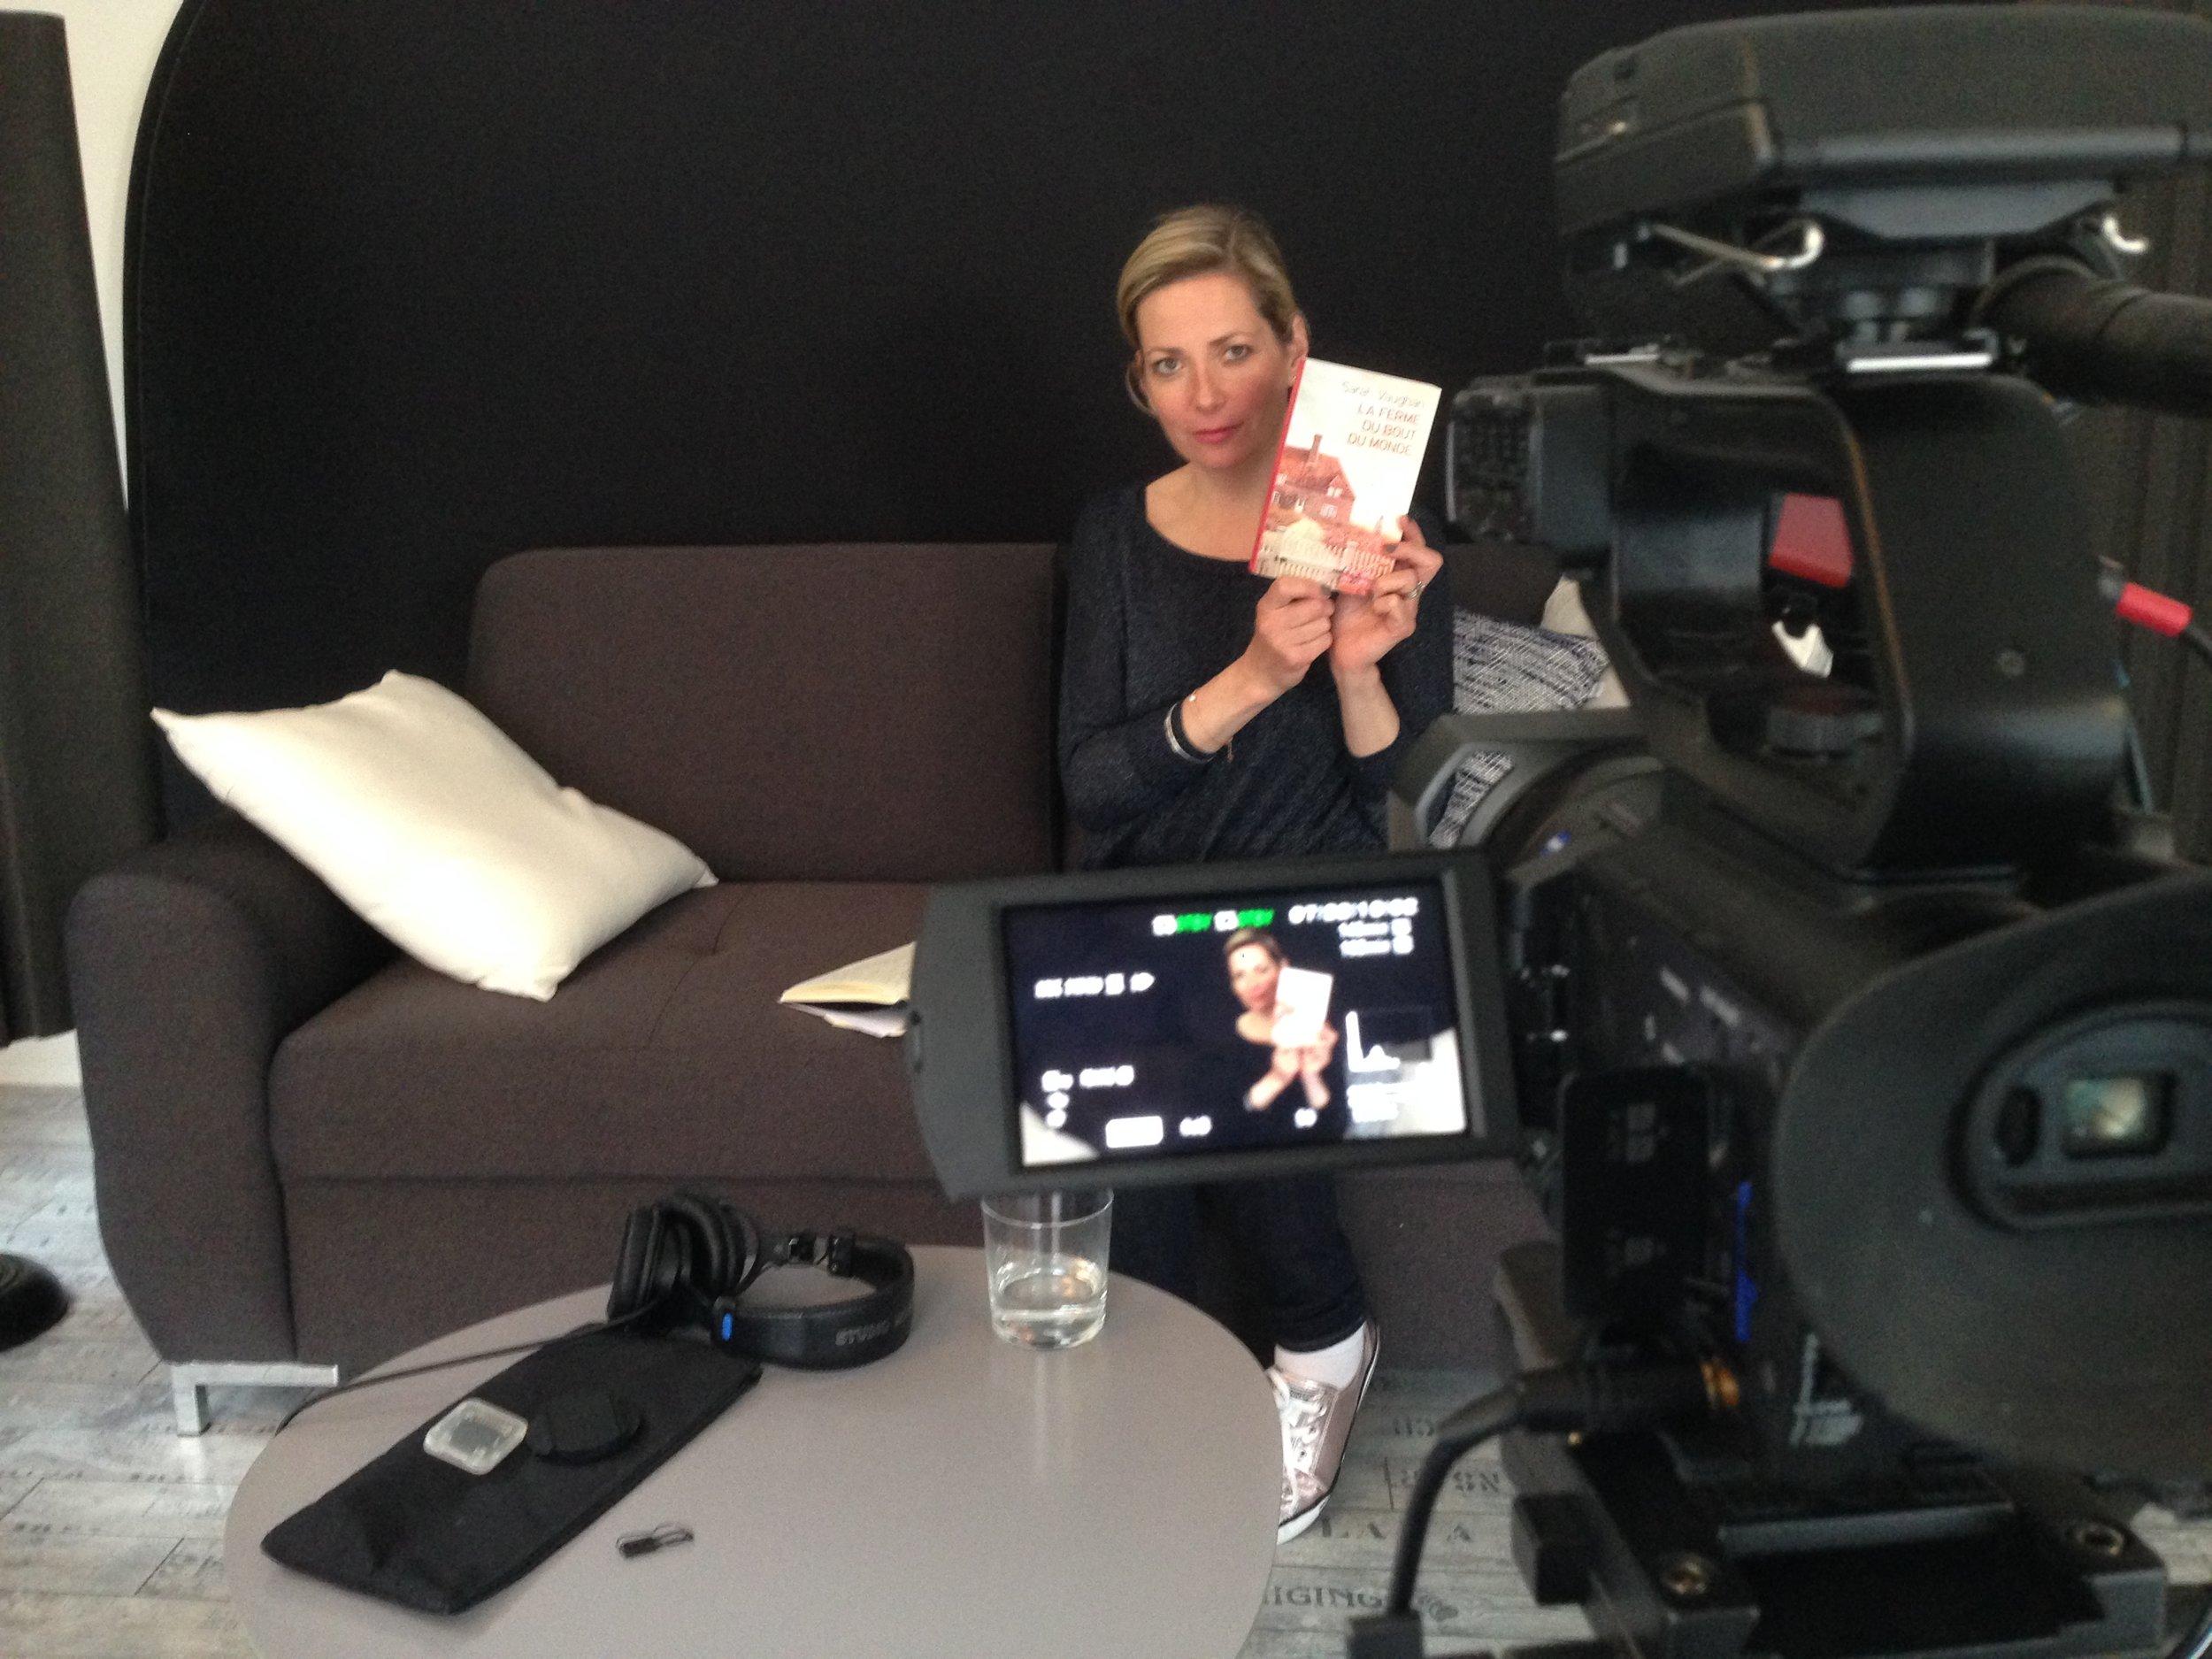 Being filmed discussing La Ferme du Bout du Monde.